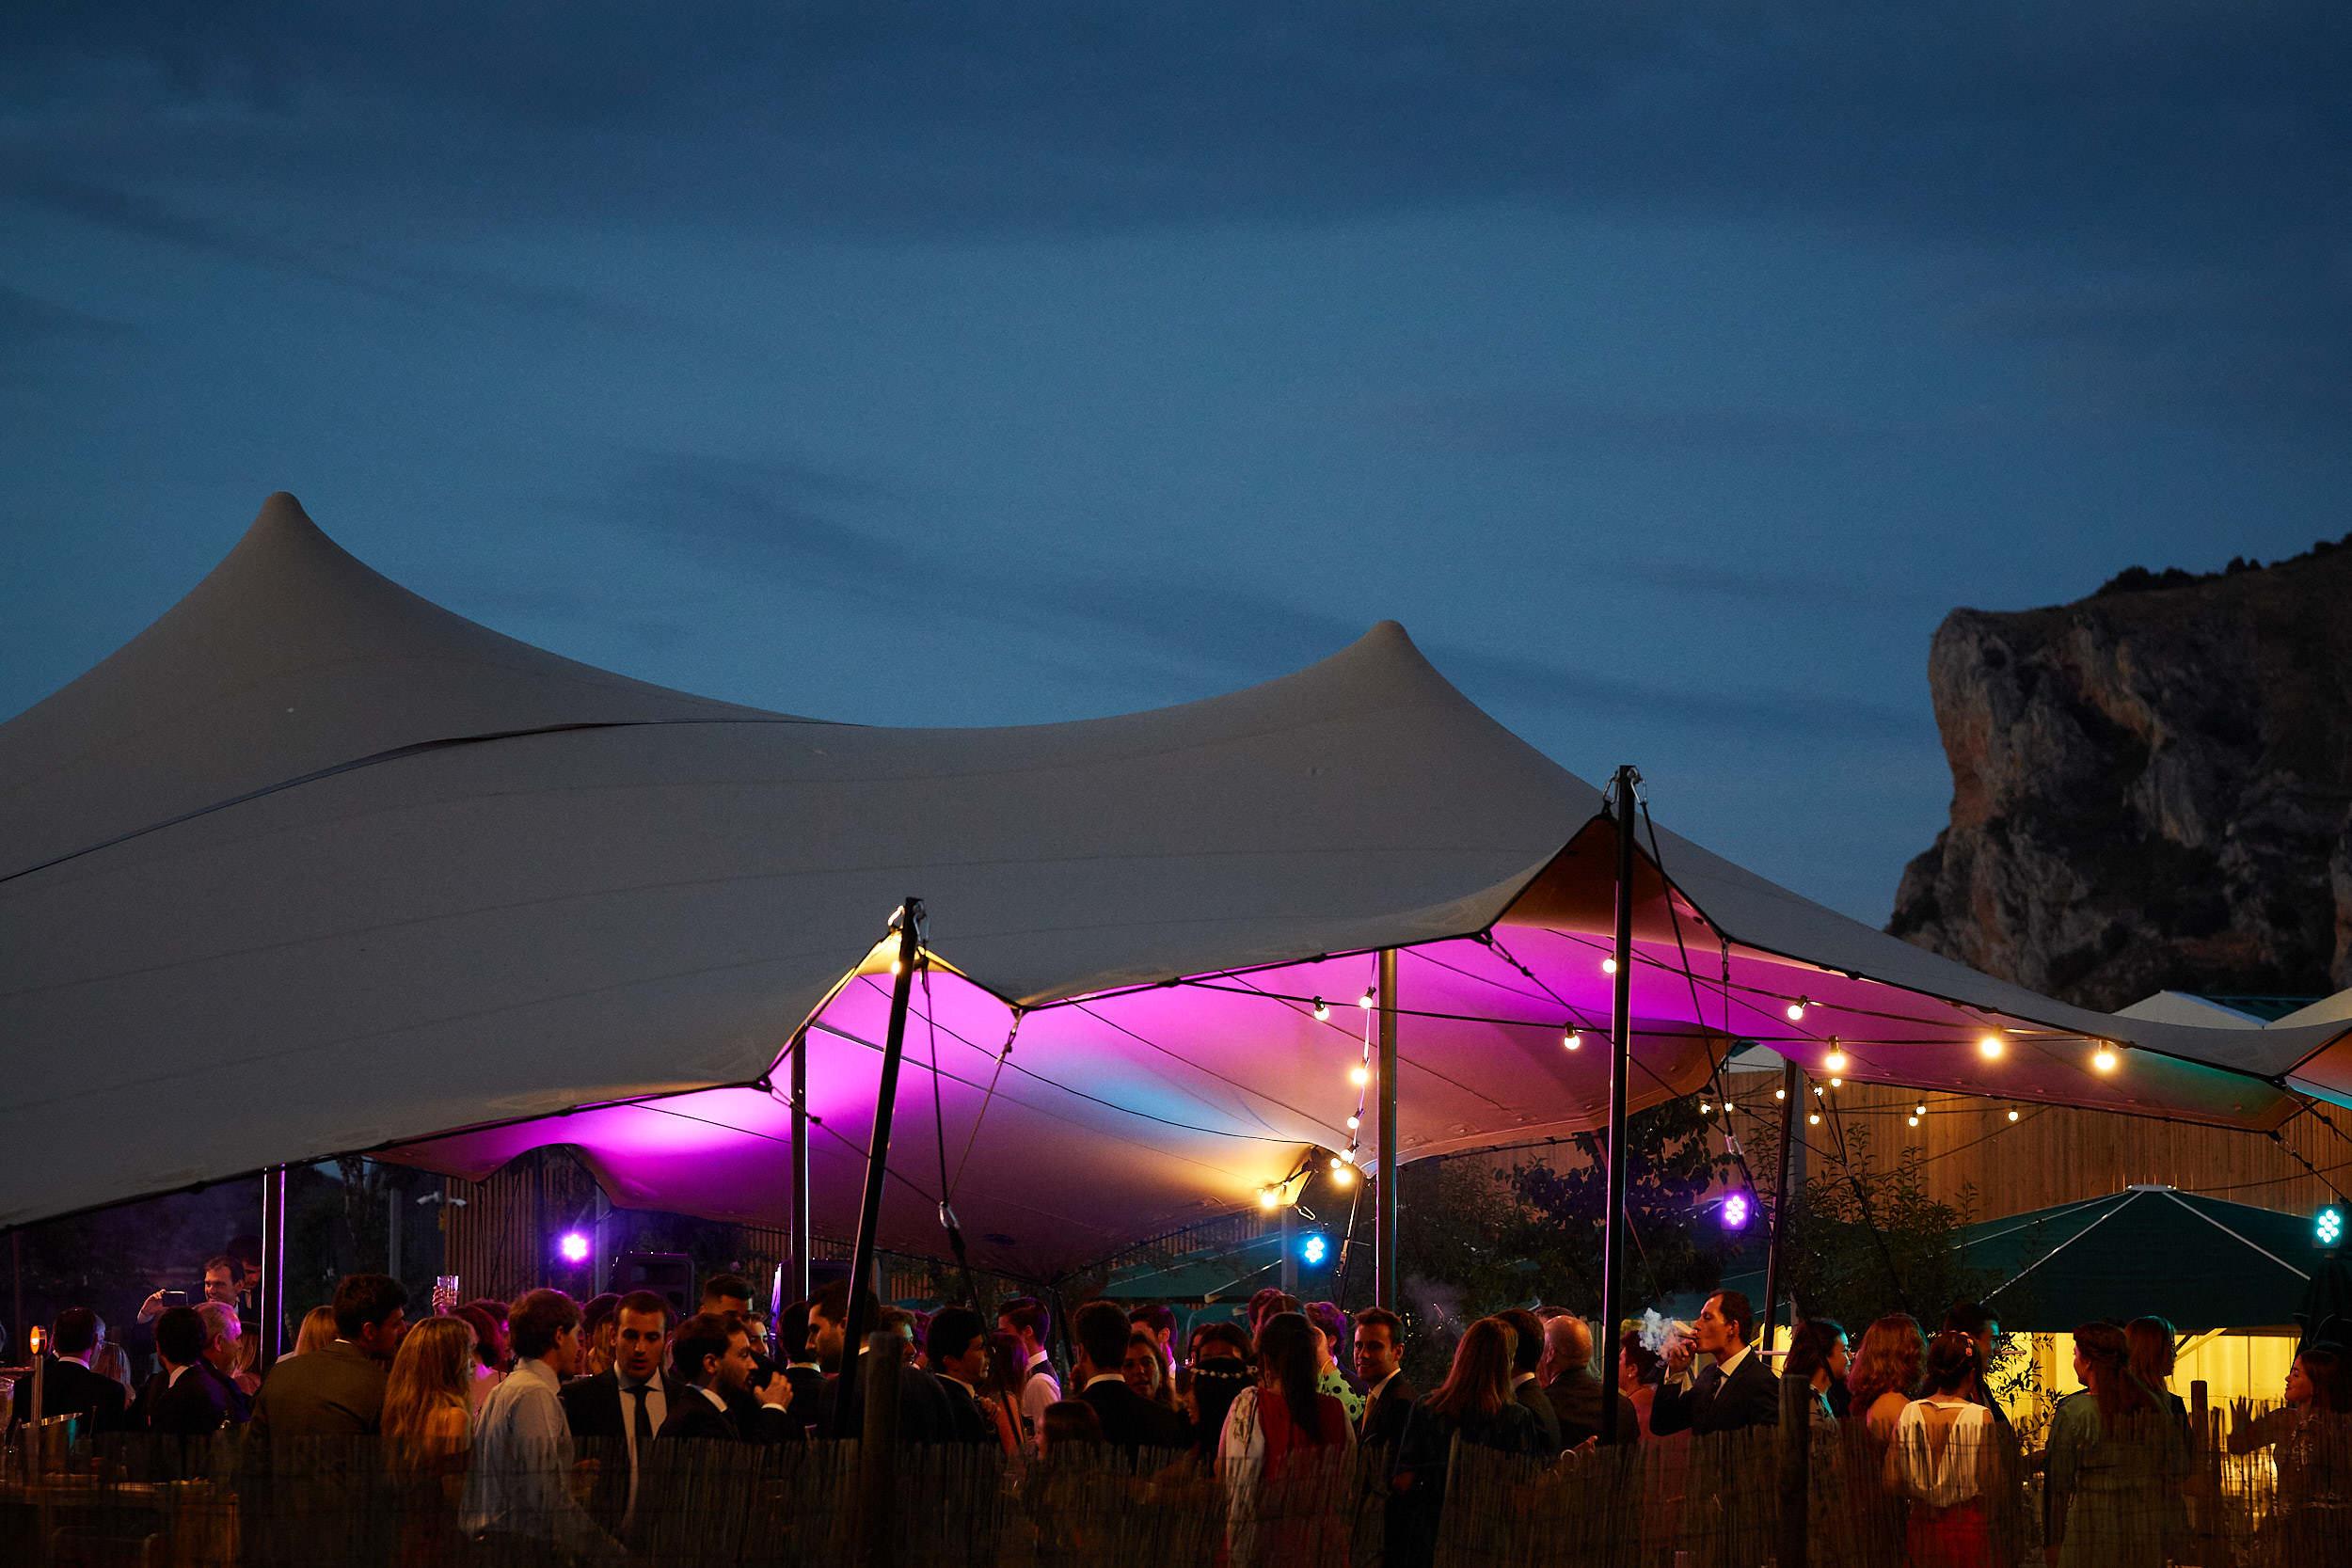 1809Basque_Country_Rioja_Wedding_Photographer_James_Sturcke_0037.jpg